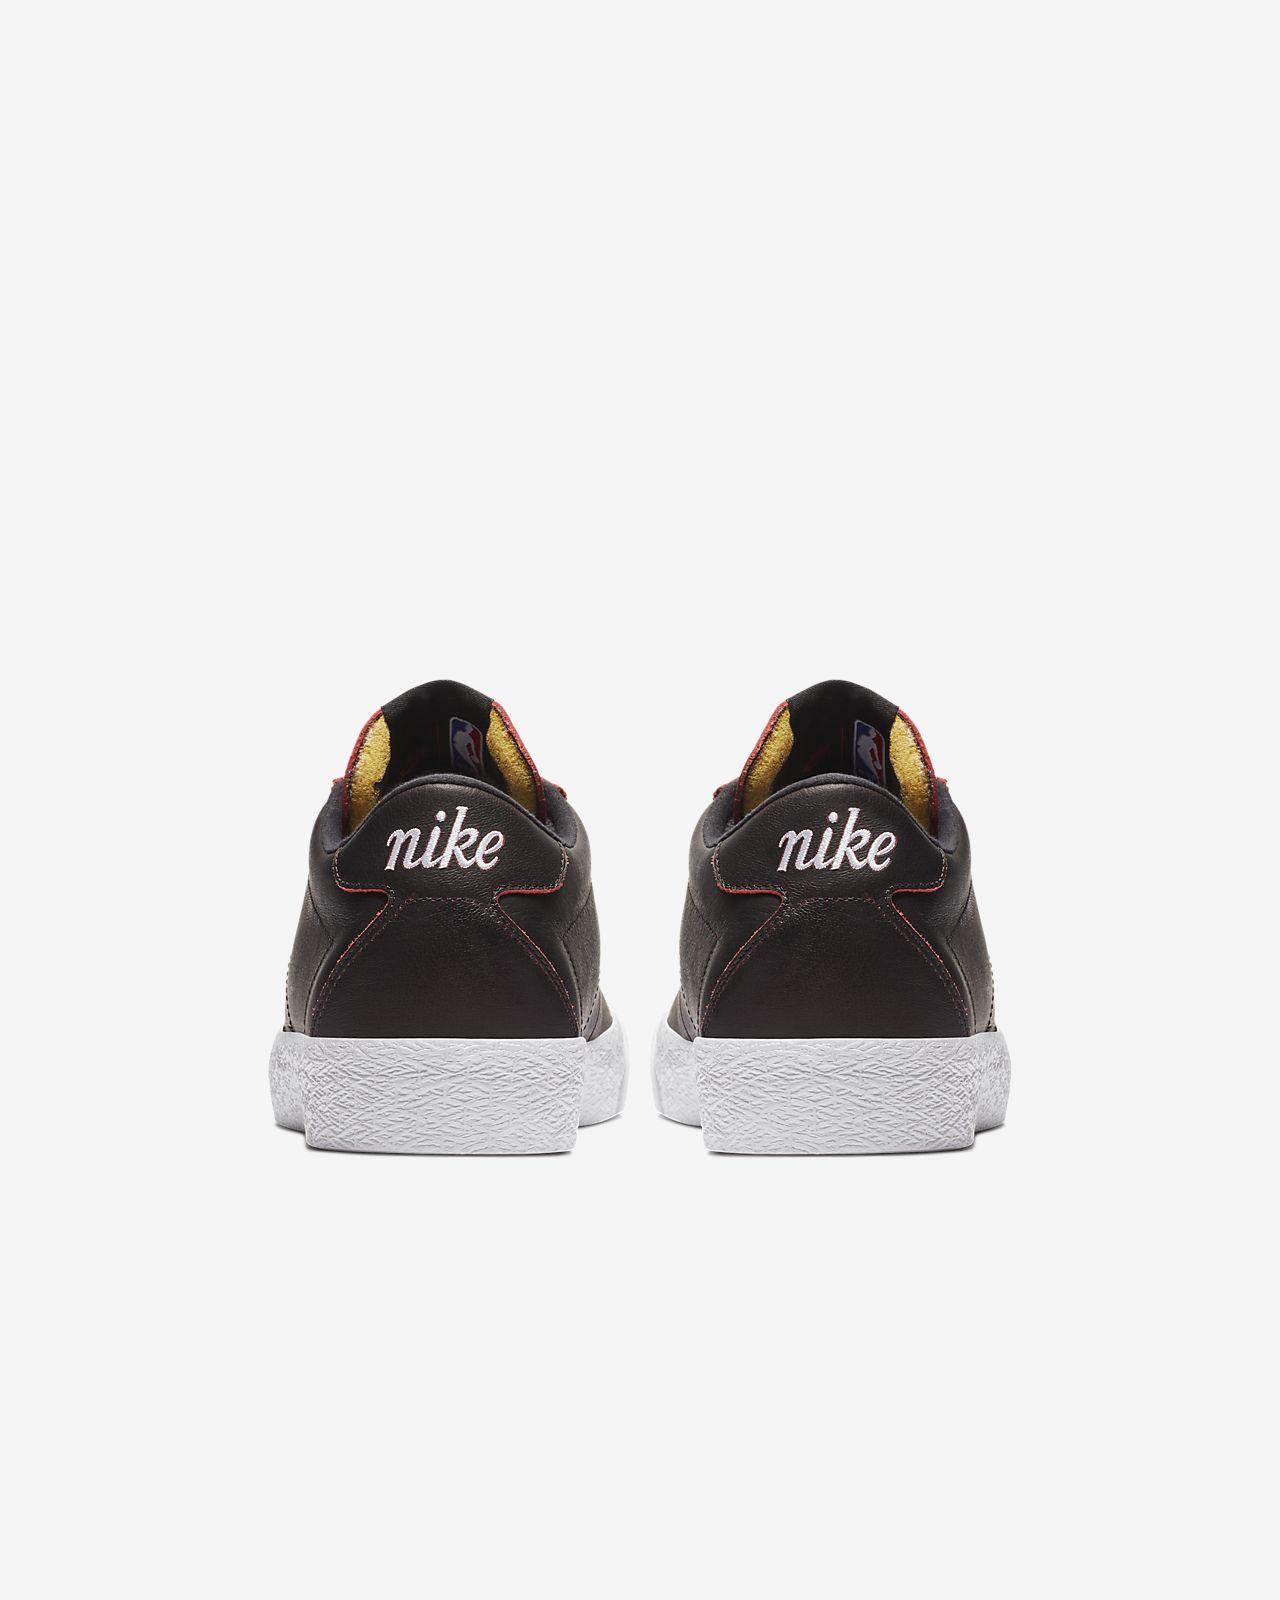 De Nike Zoom Bruin Nba Chaussure Skate Sb fYb76gy